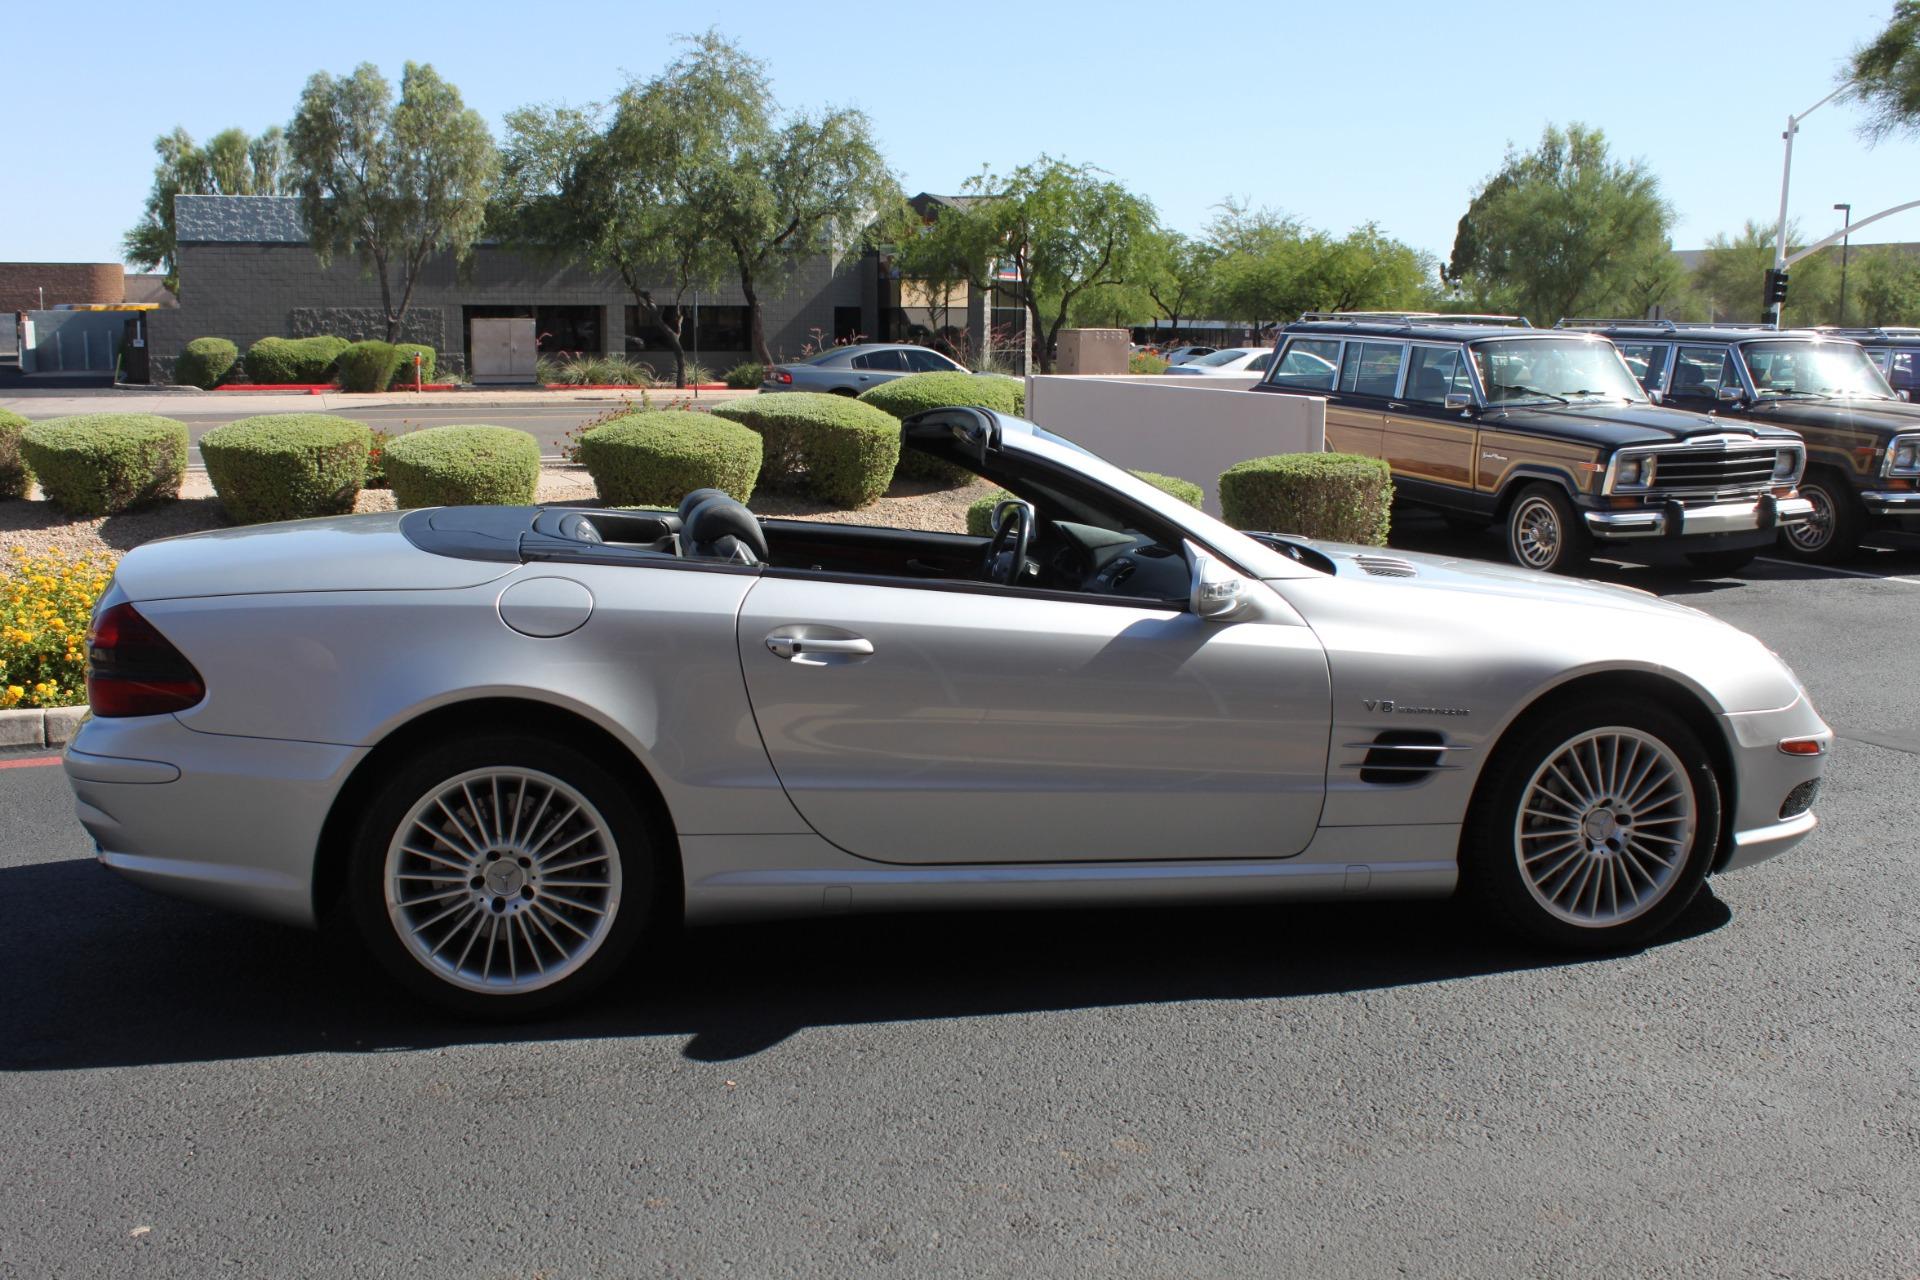 Used-2003-Mercedes-Benz-SL-Class-AMG-Chrysler